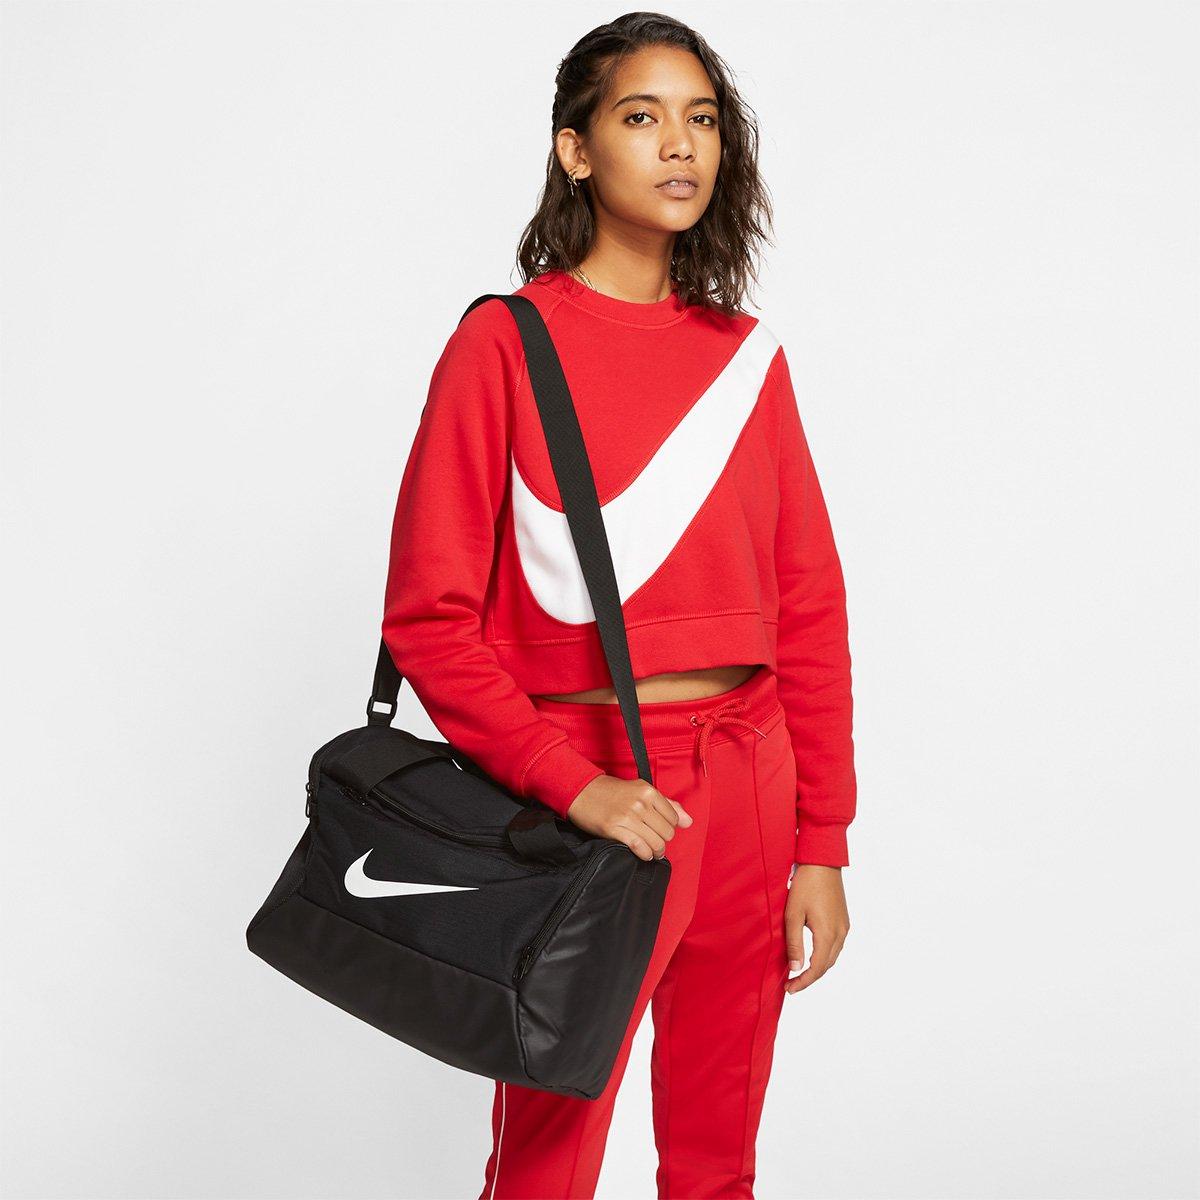 Bolsa Nike Brasilia Xs Duff 9.0 - 25 Litros - 2